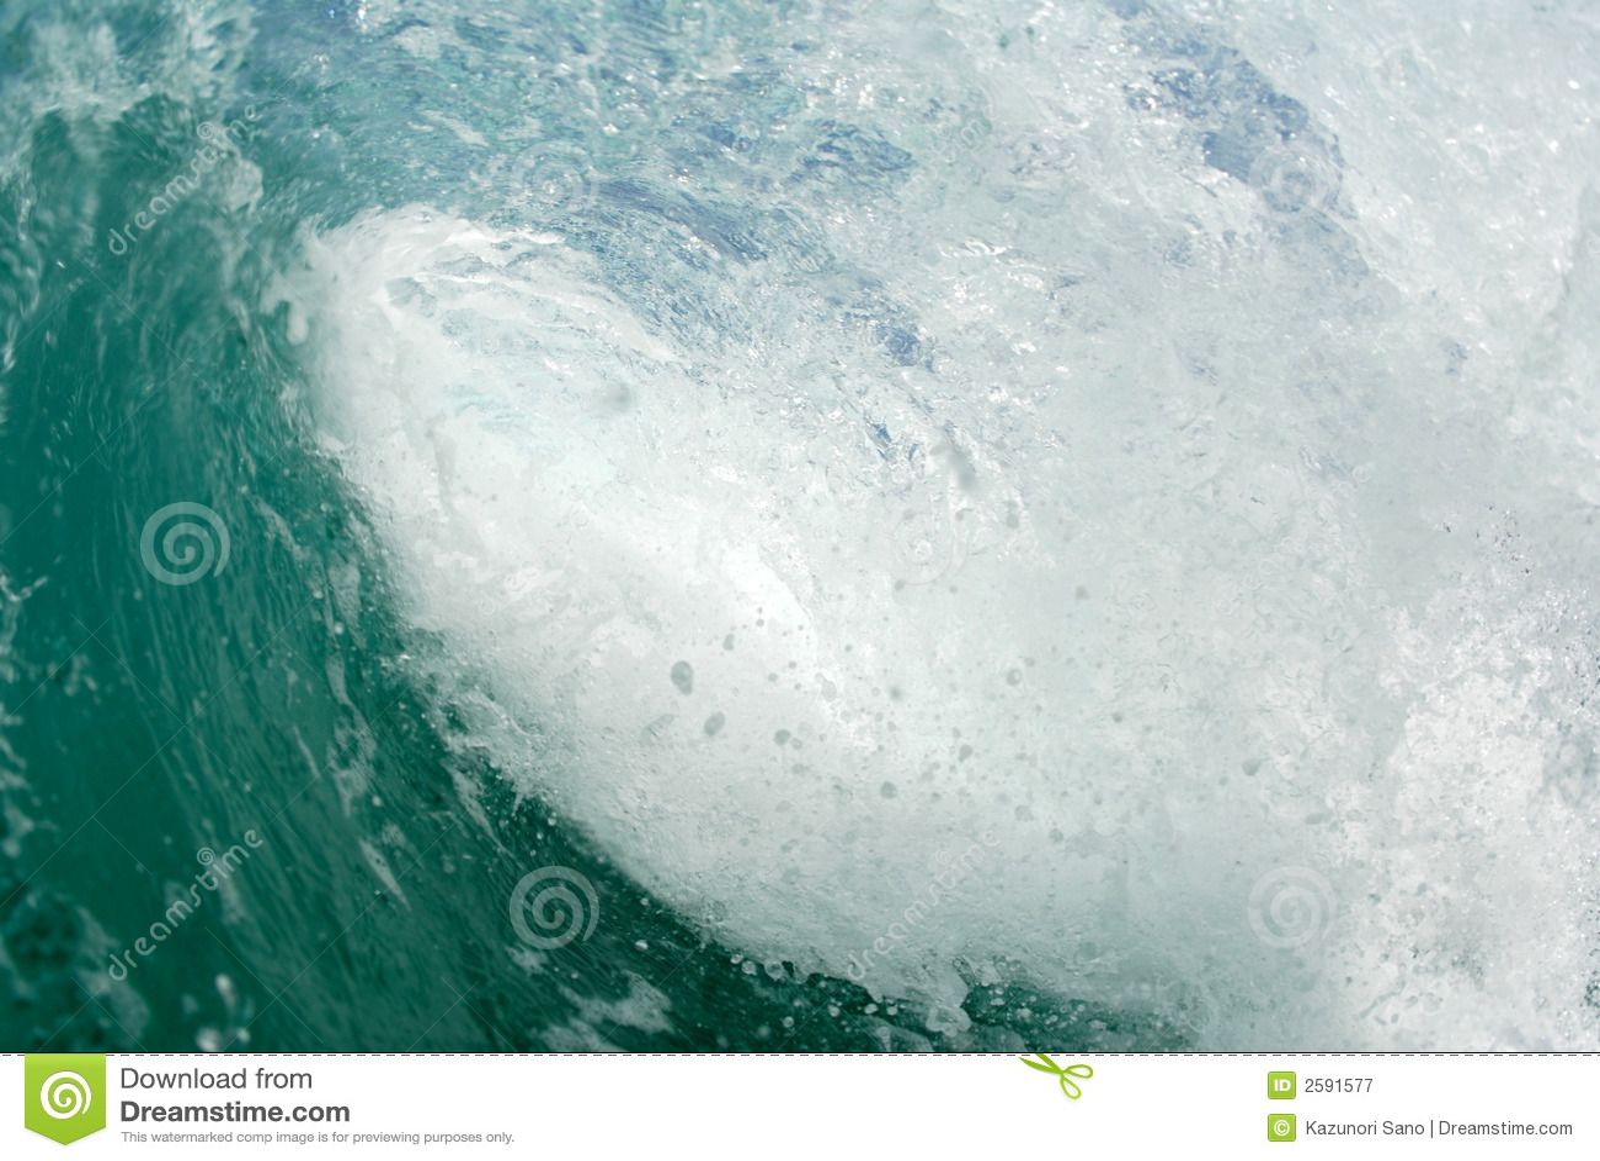 Inside the Barreling wave